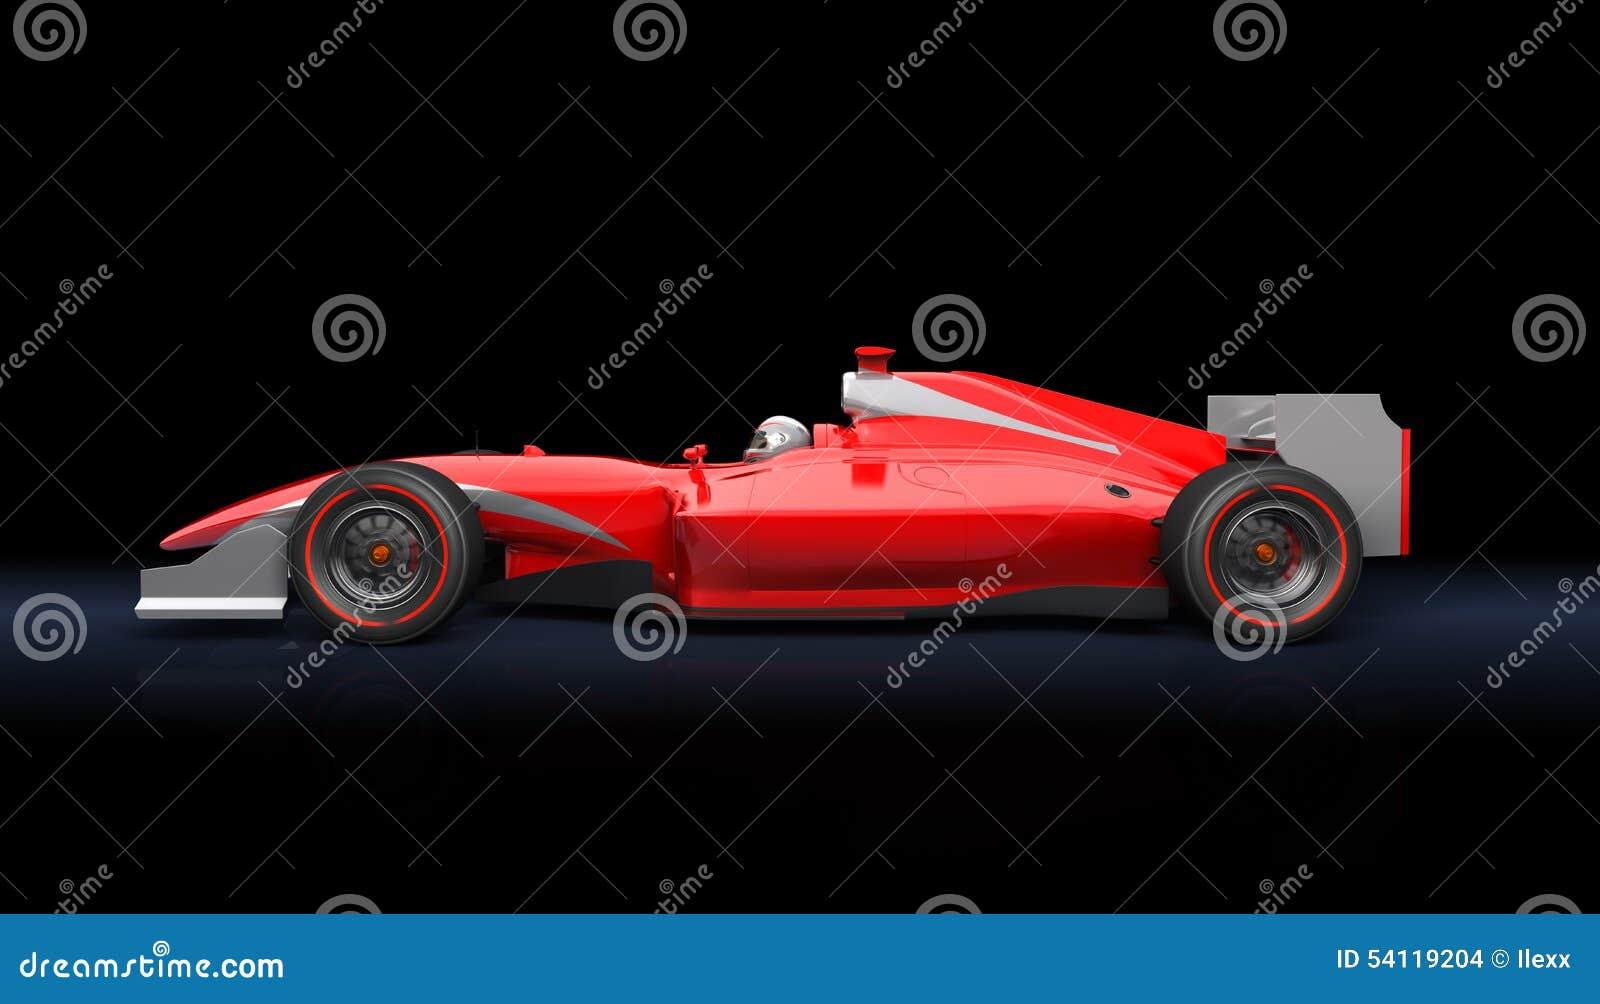 Generic red race car